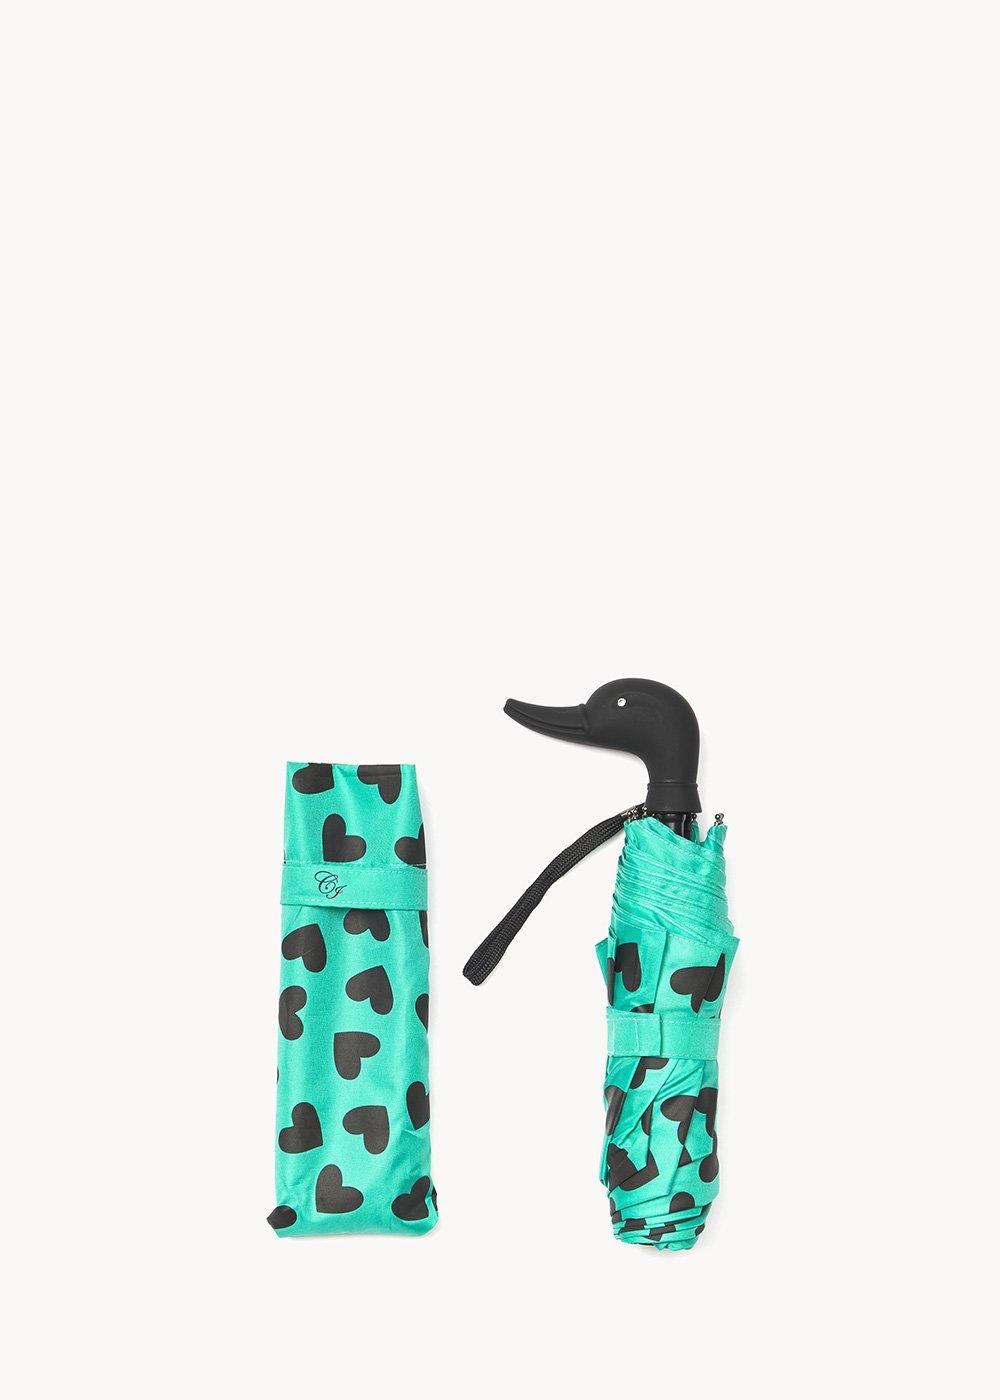 Heart-patterned umbrella - Smeraldo / Black Fantasia - Woman